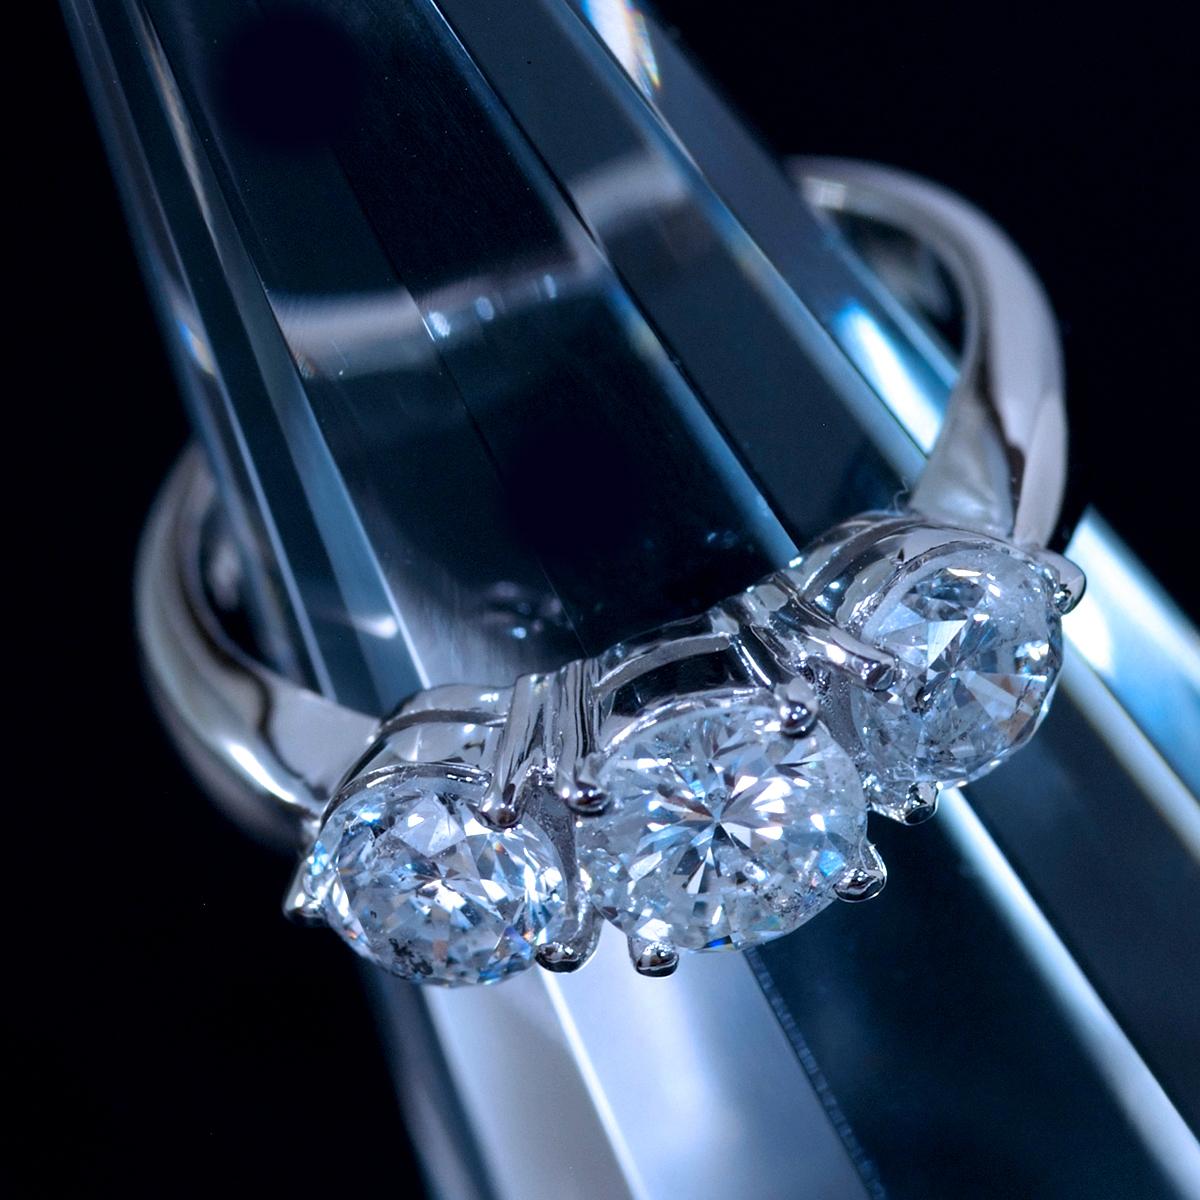 F1262 美しい大粒天然ダイヤモンド2.02ct 最高級Pt900無垢セレブリティリング サイズ12号 重量6.49g 縦幅5.9mm_画像3